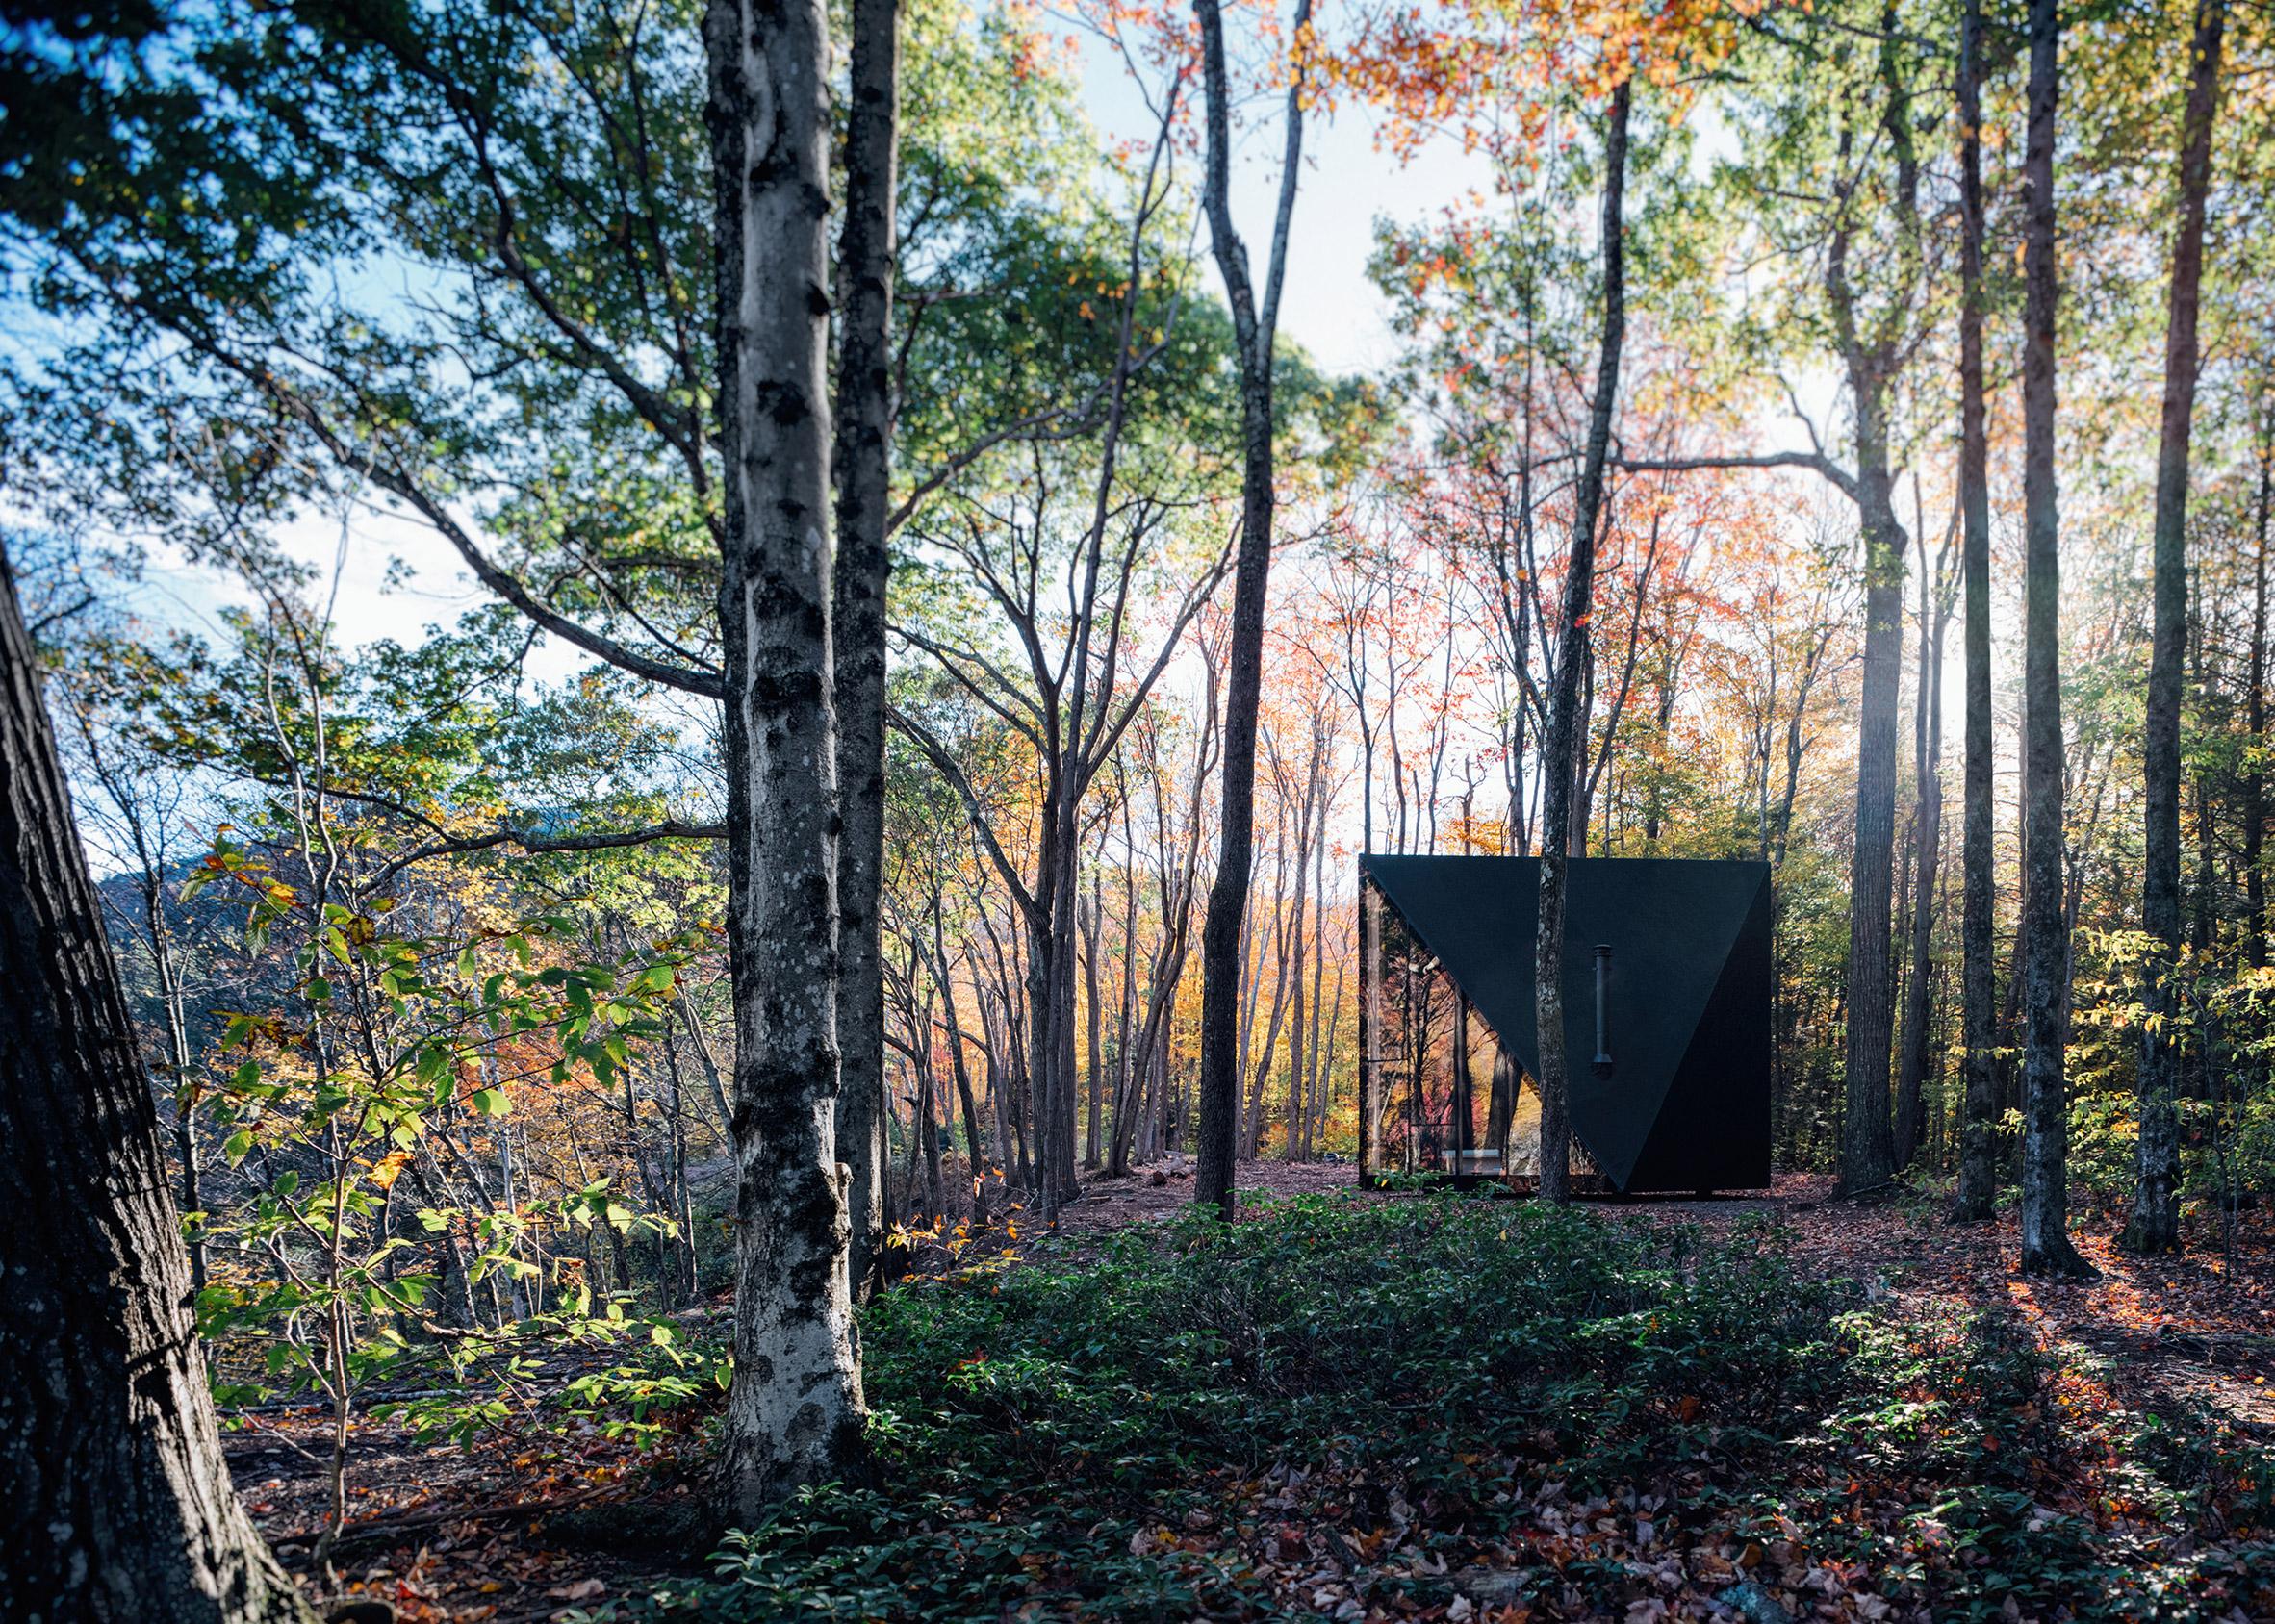 Klein A45, Catskill Mountains, New York by Bjarke Ingels Group